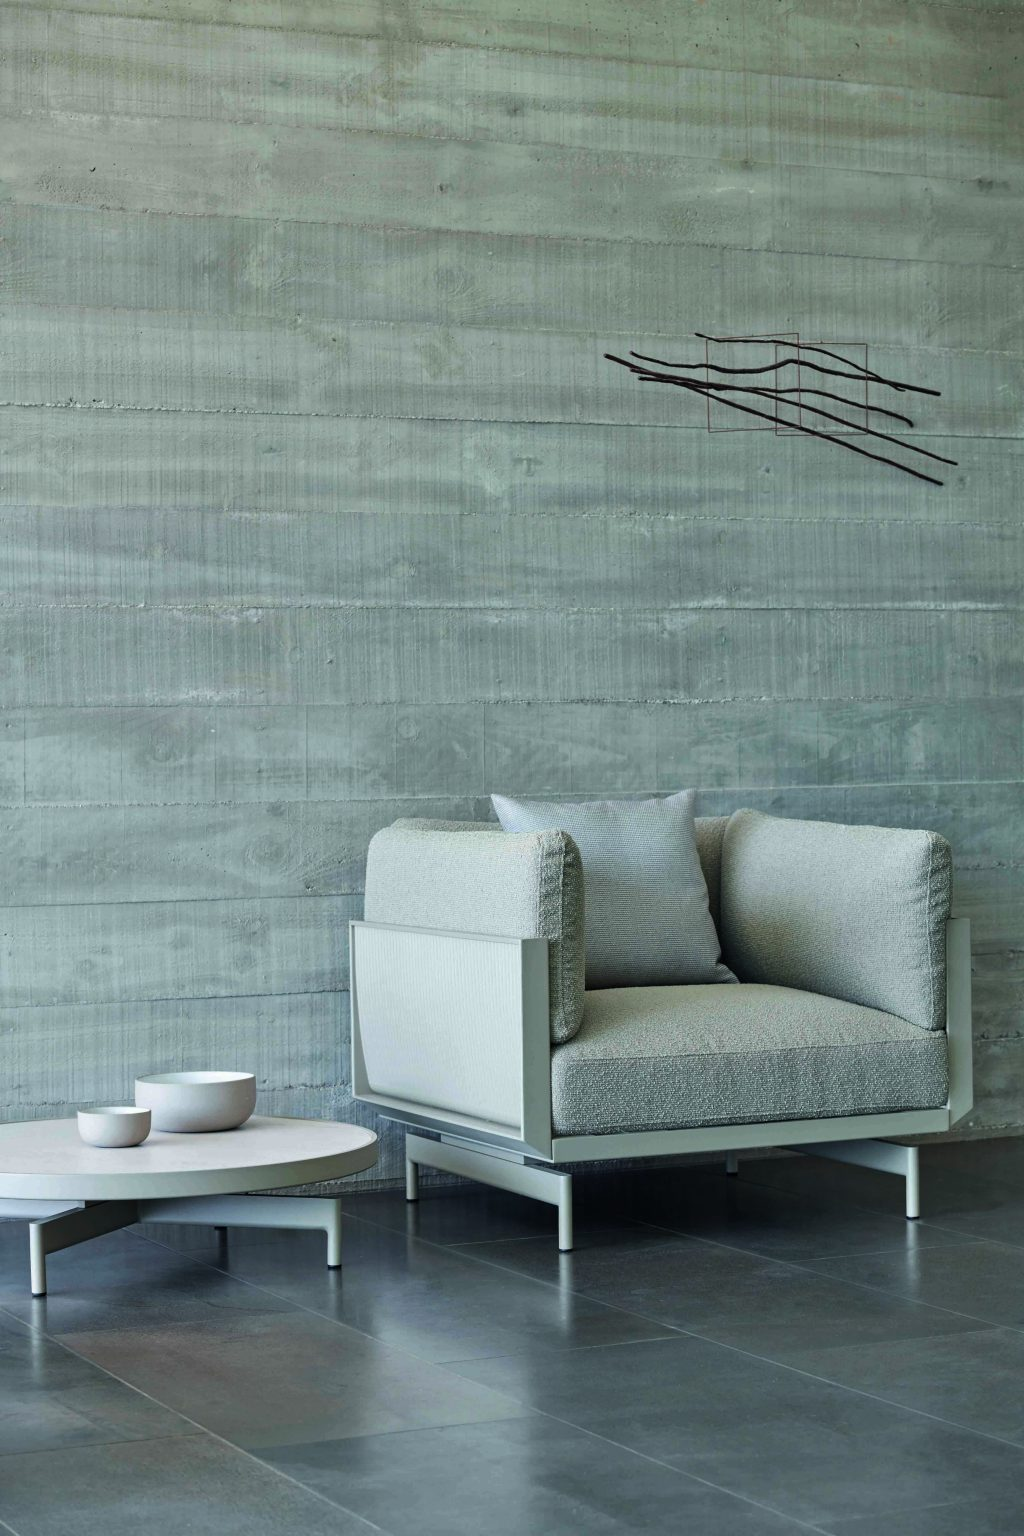 Biennale Interieur - Belgium's leading design and interior event - Onde-composition-sofa-sand-02-detail.jpg